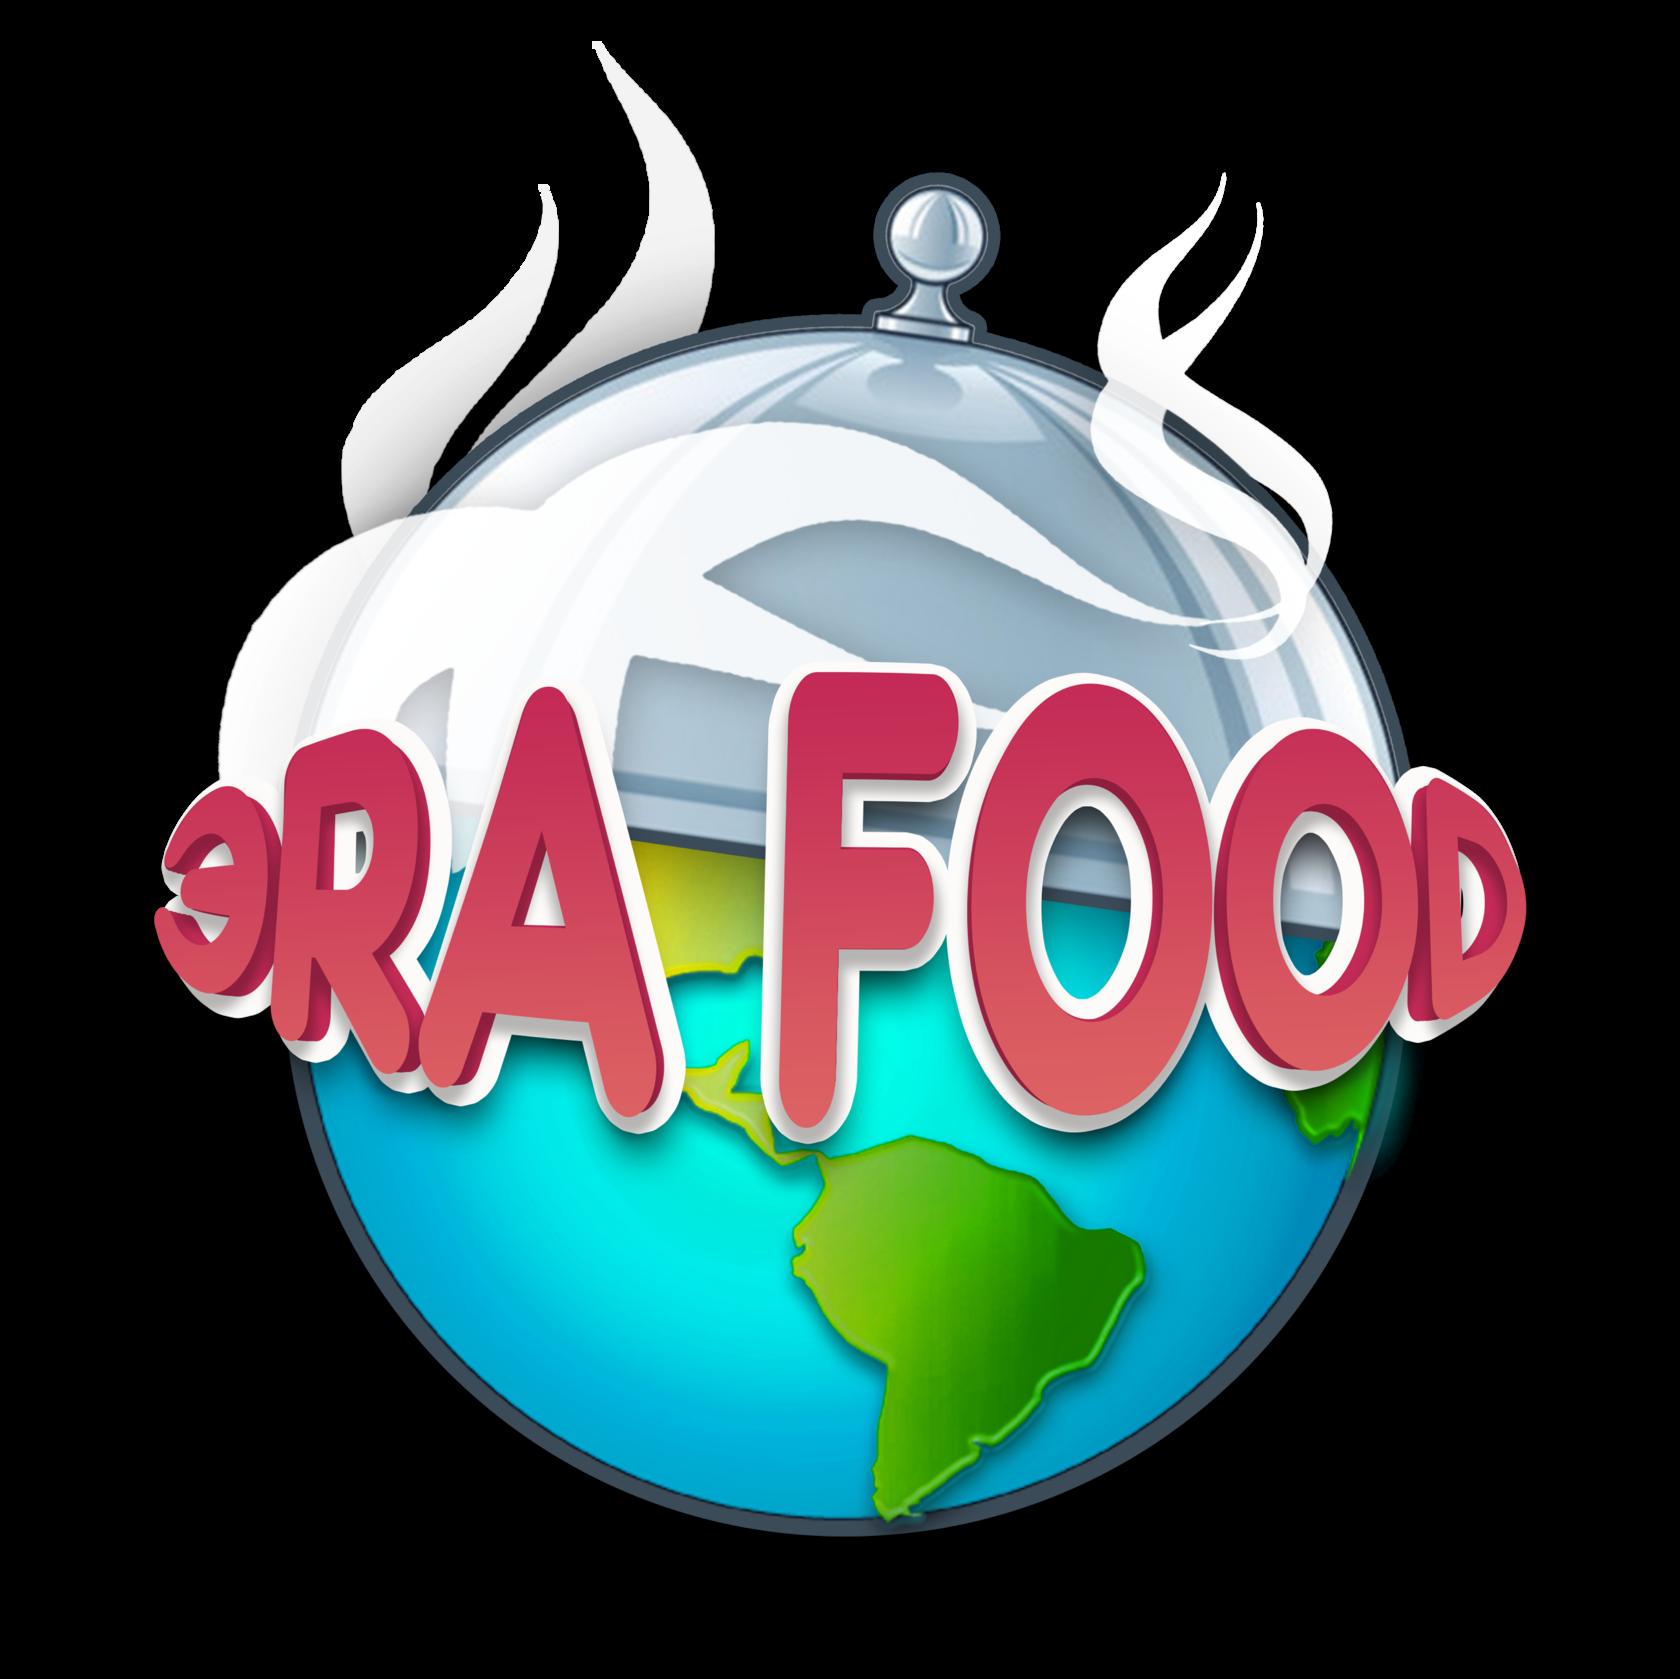 ЭRA FOOD